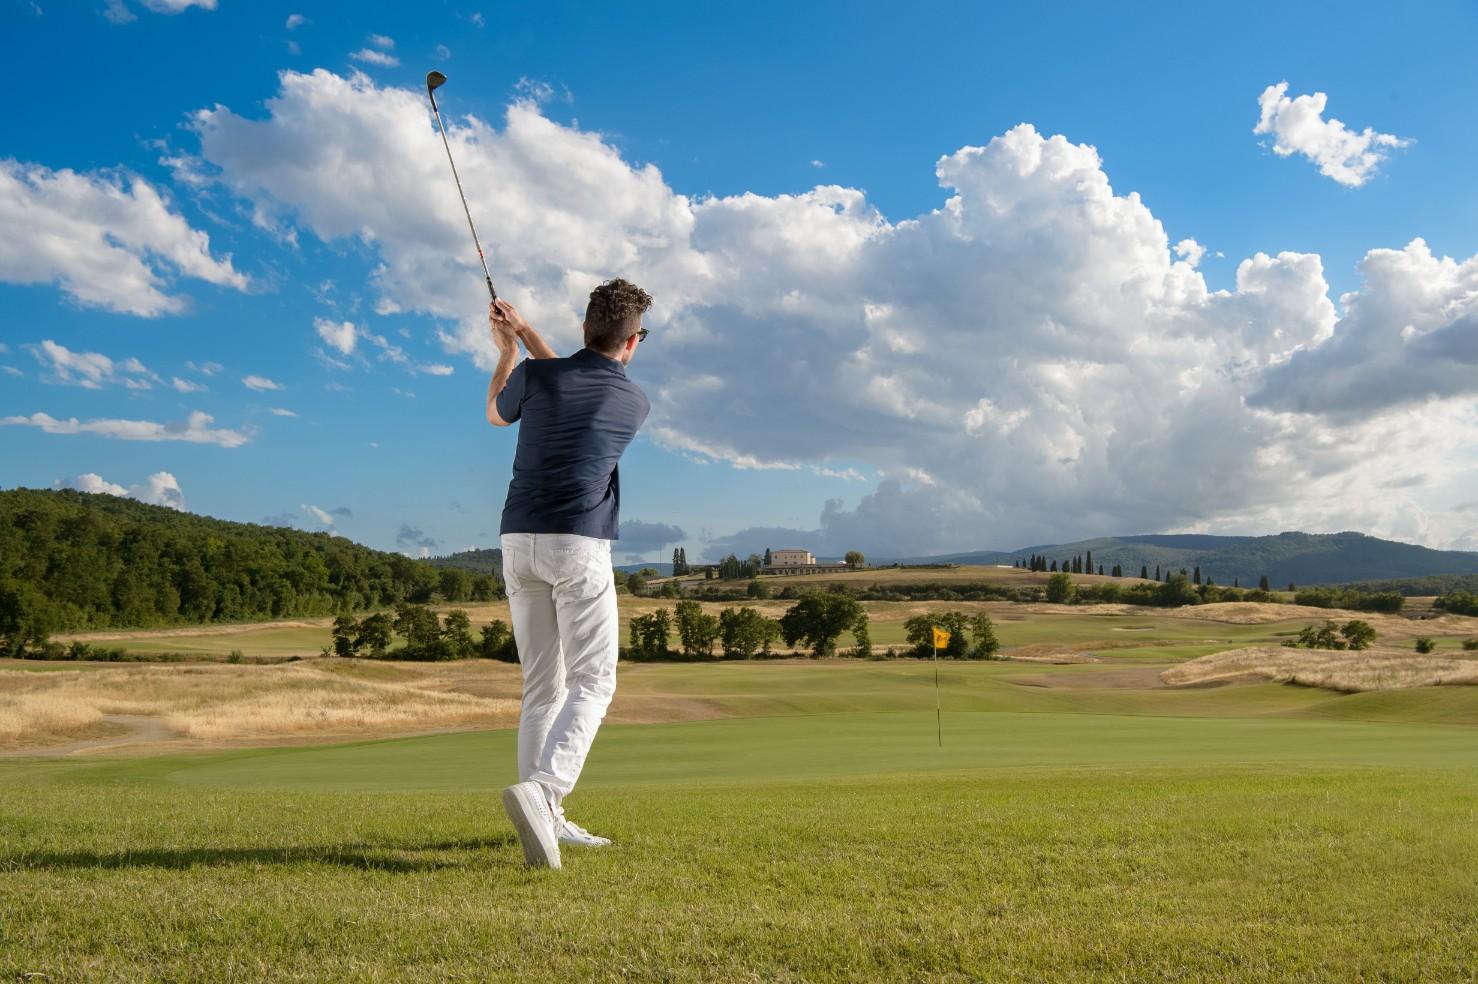 La_bagnaia Golf Planet Holiday